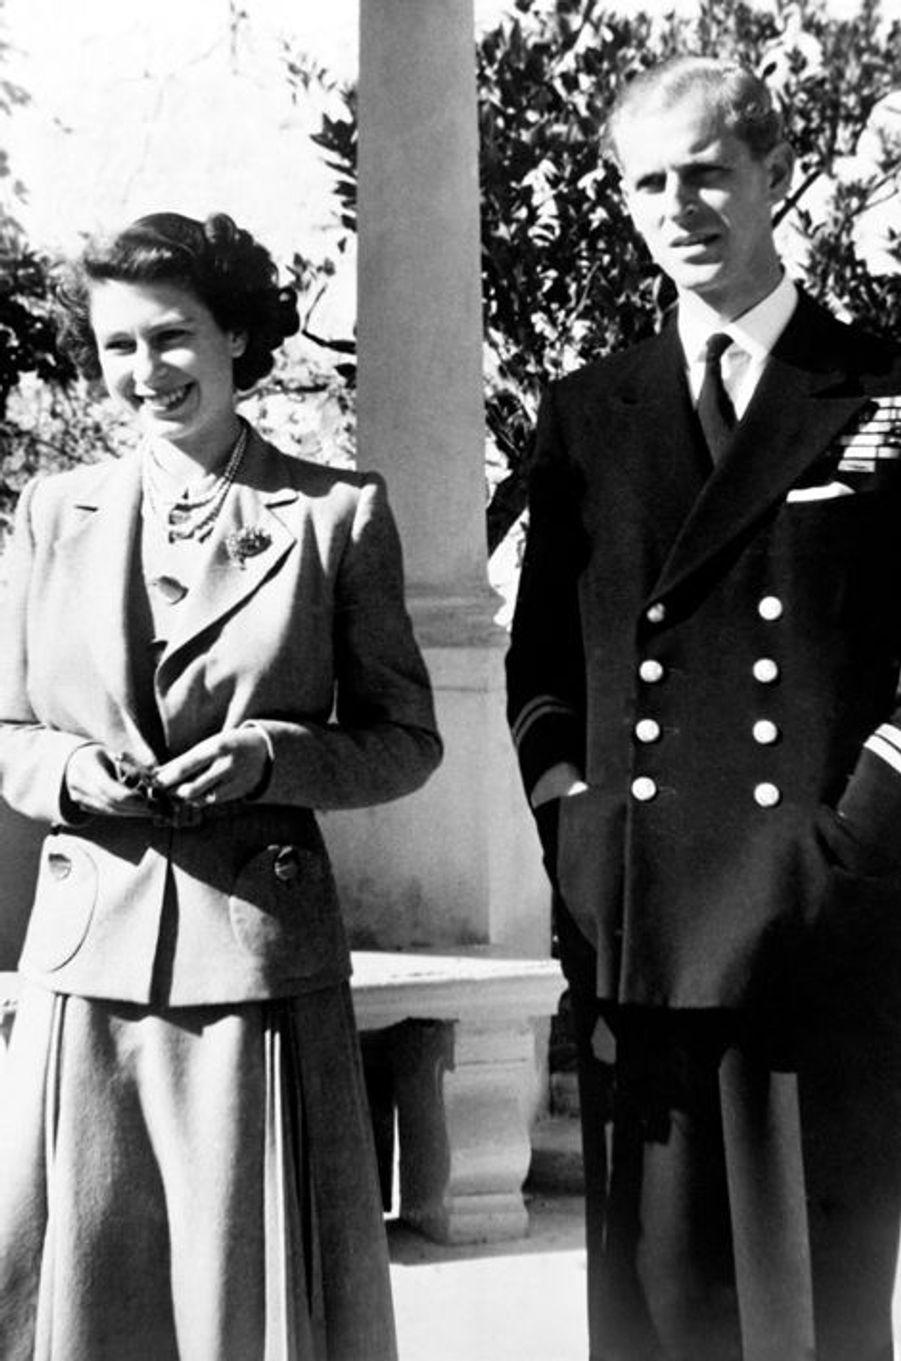 La princesse Elizabeth avec son mari le prince Philip, le 25 novembre 1949